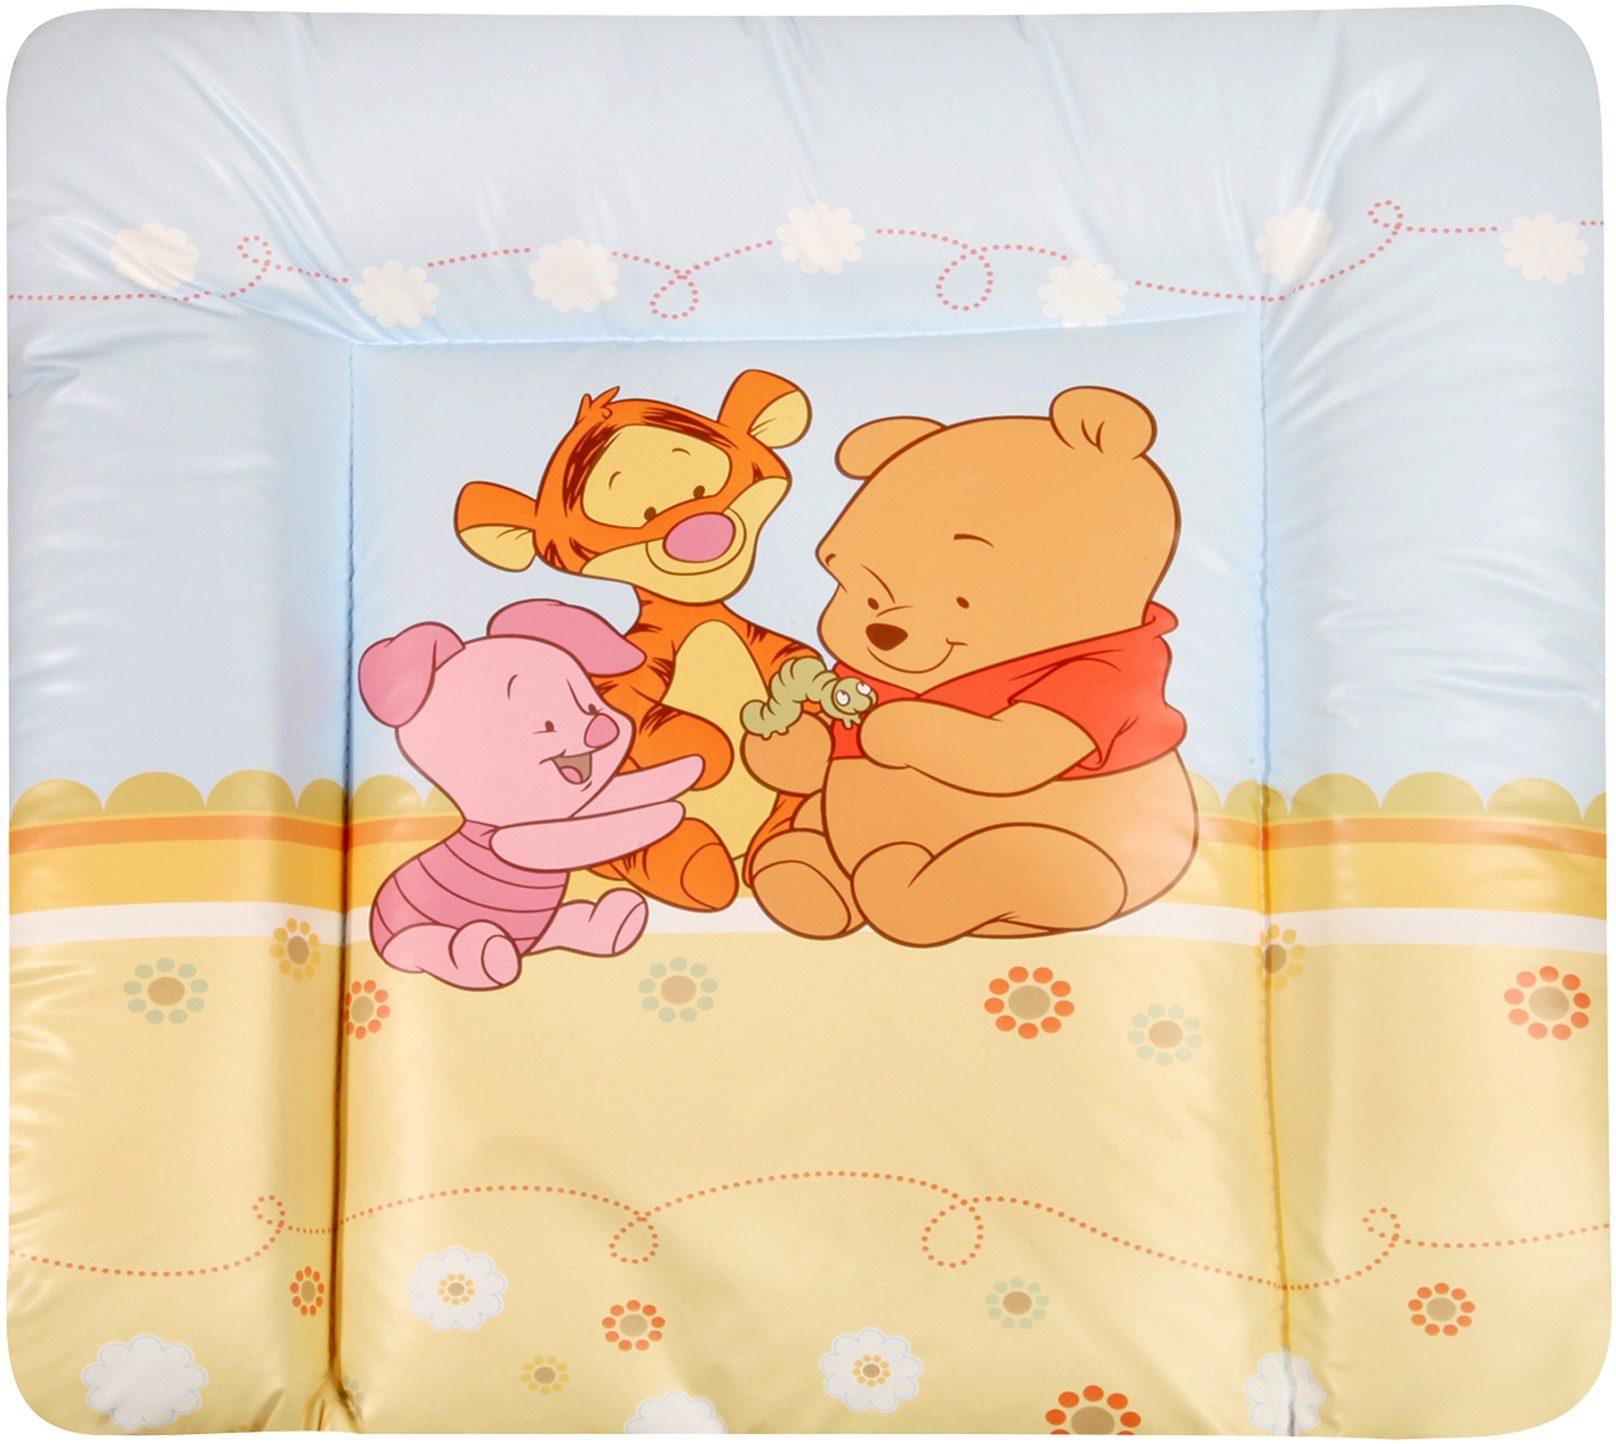 Disney Folien - Wickelauflage »Pooh and Friends«